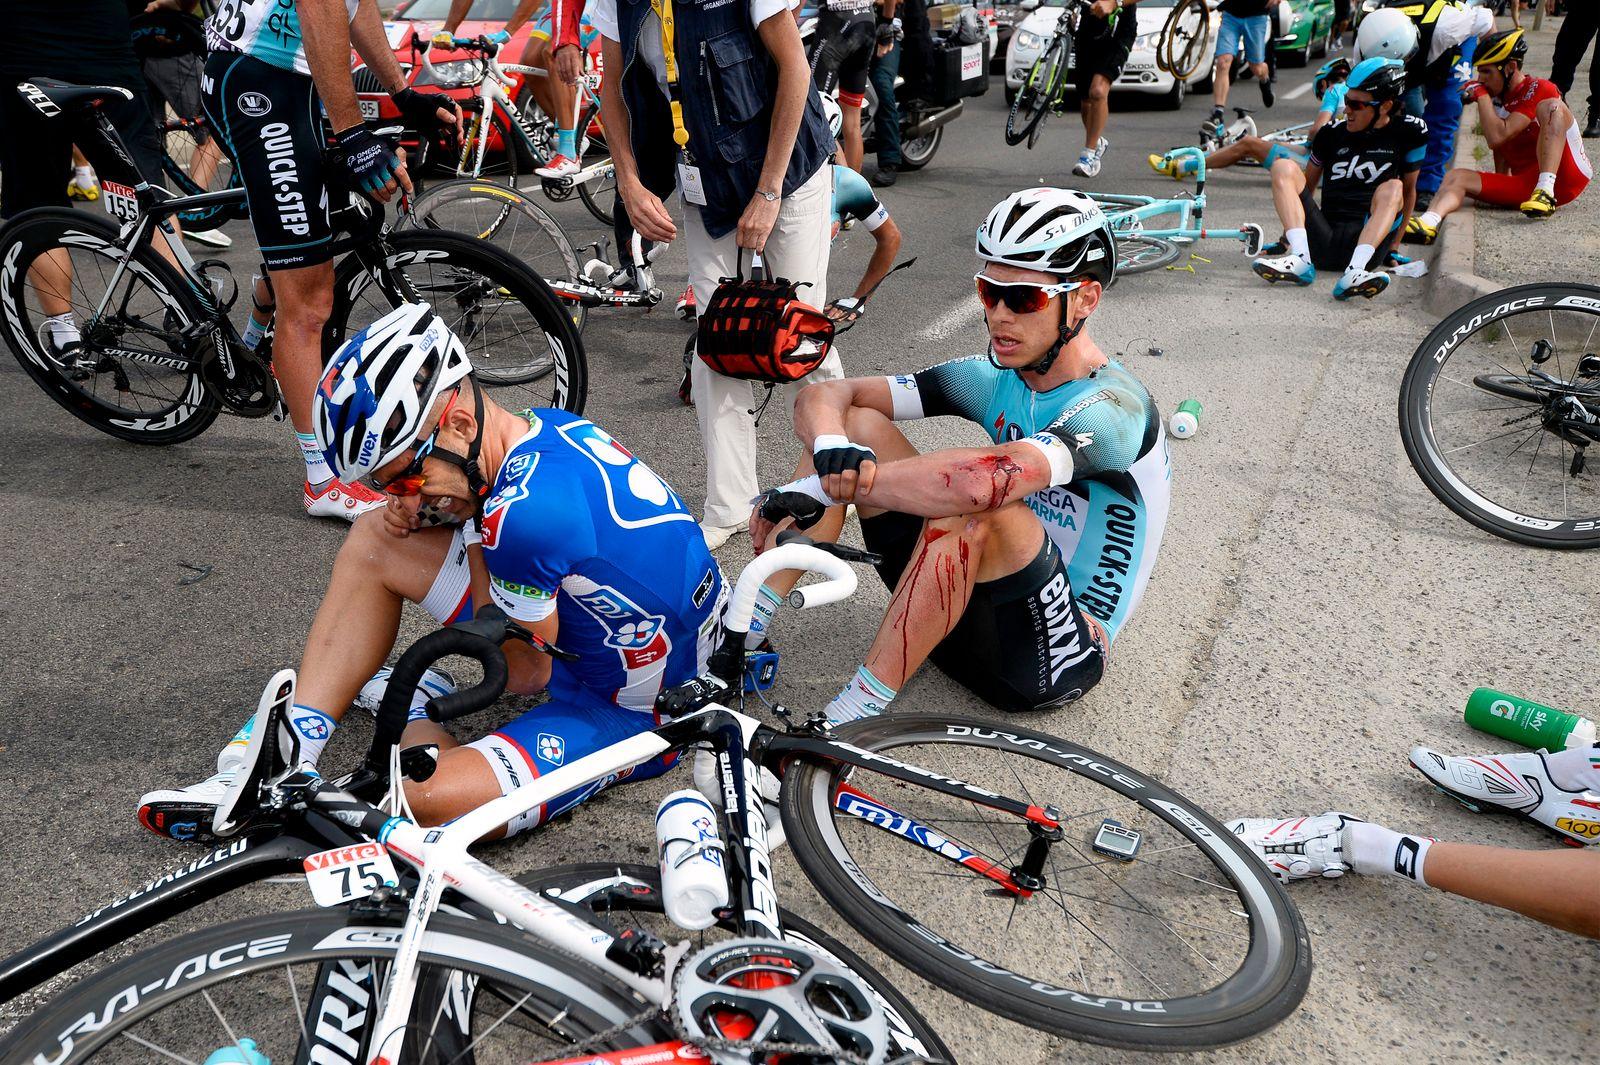 Cycling : 100th Tour de France 2013 / Stage 1